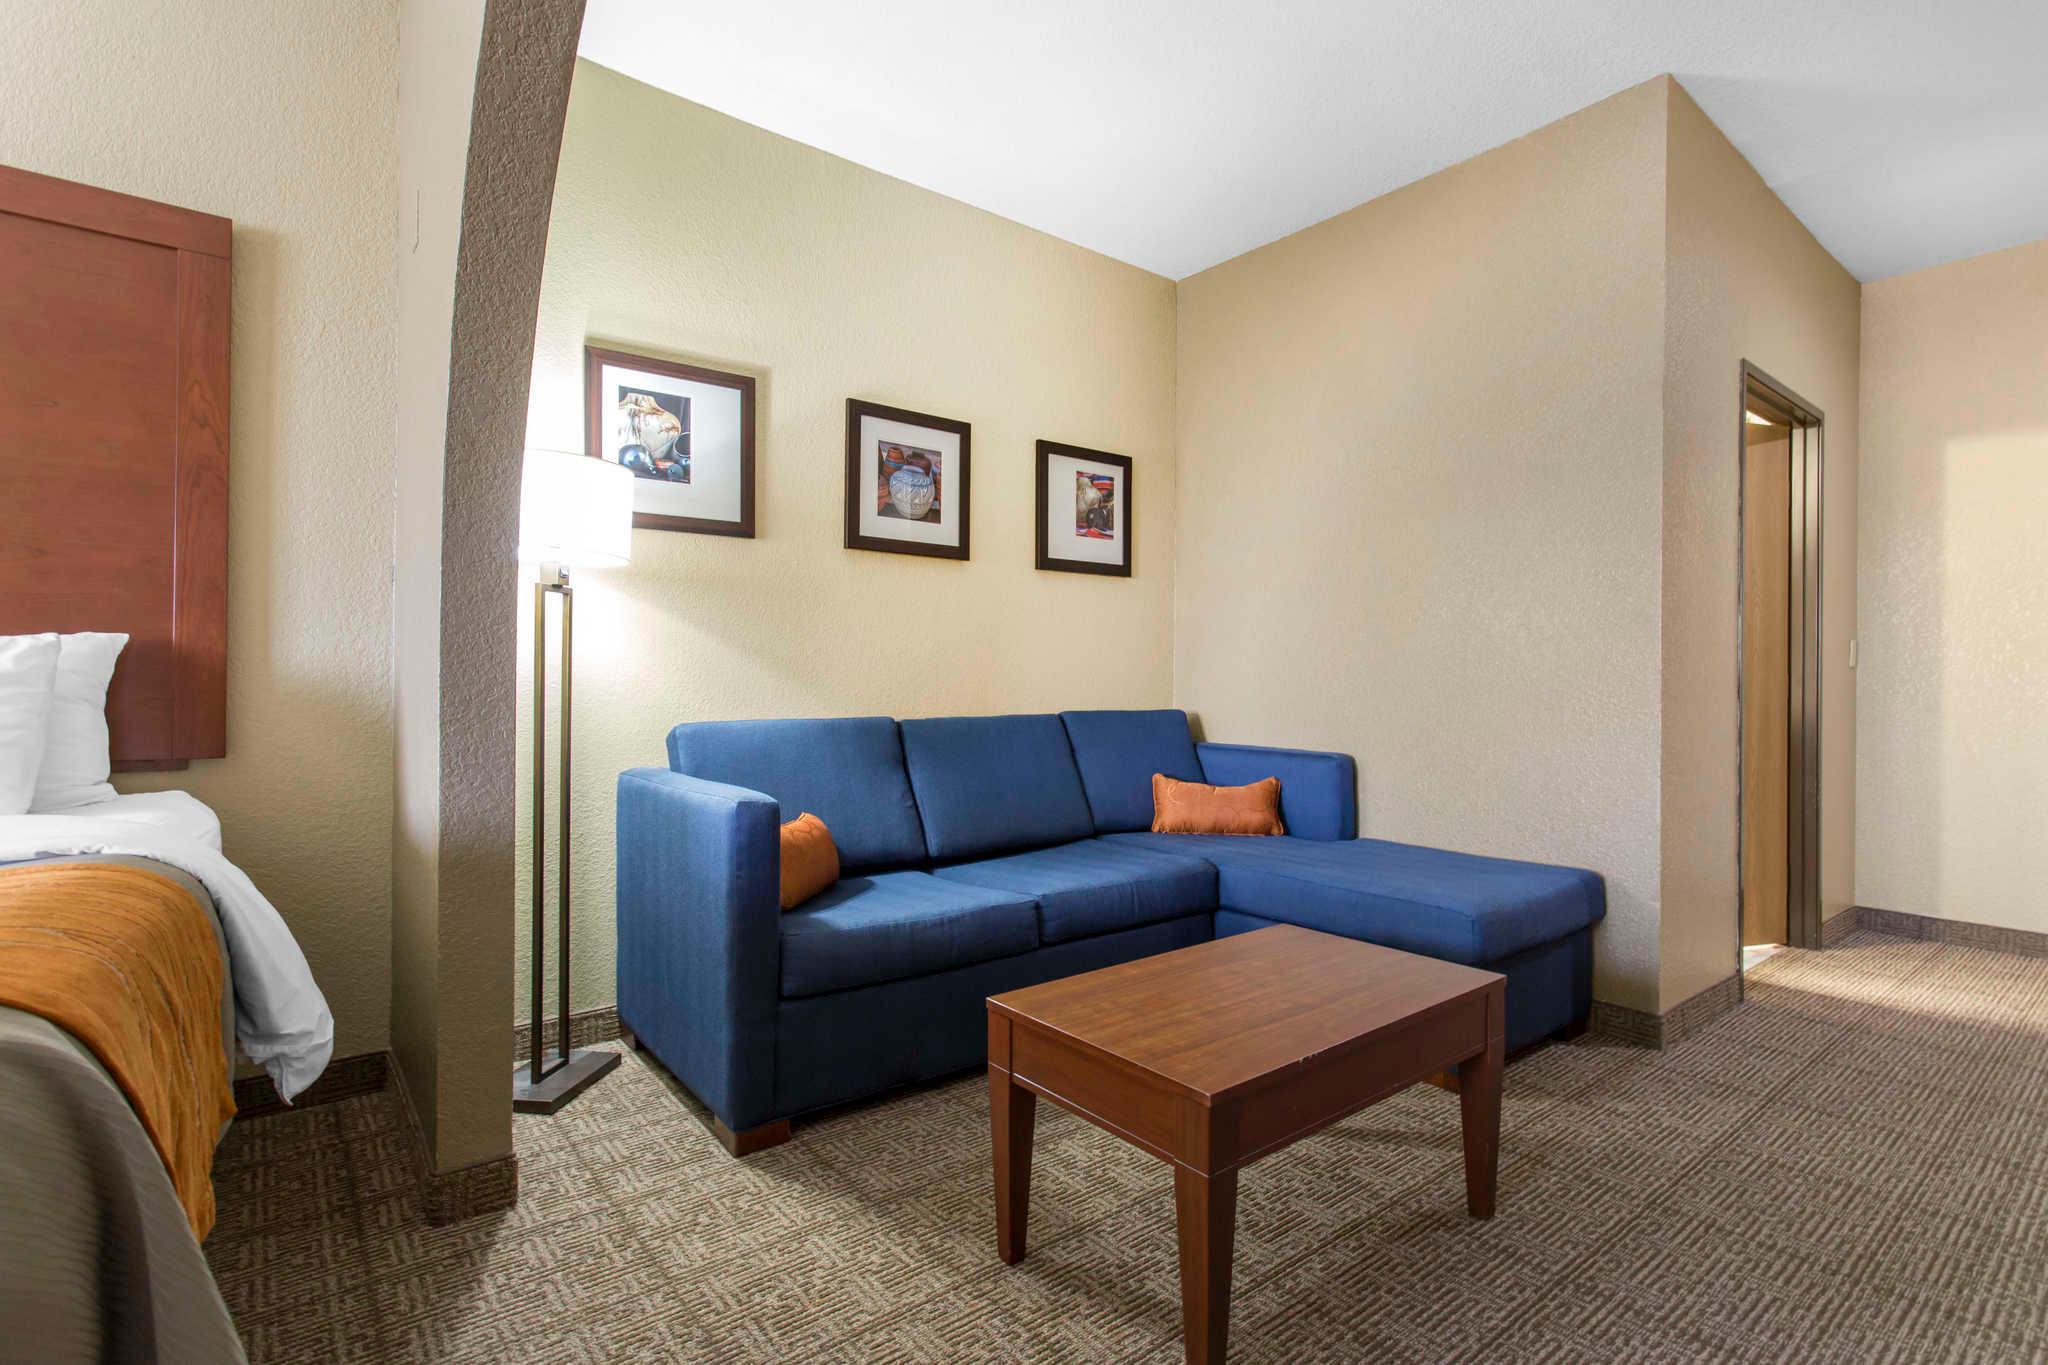 Comfort Inn & Suites image 19